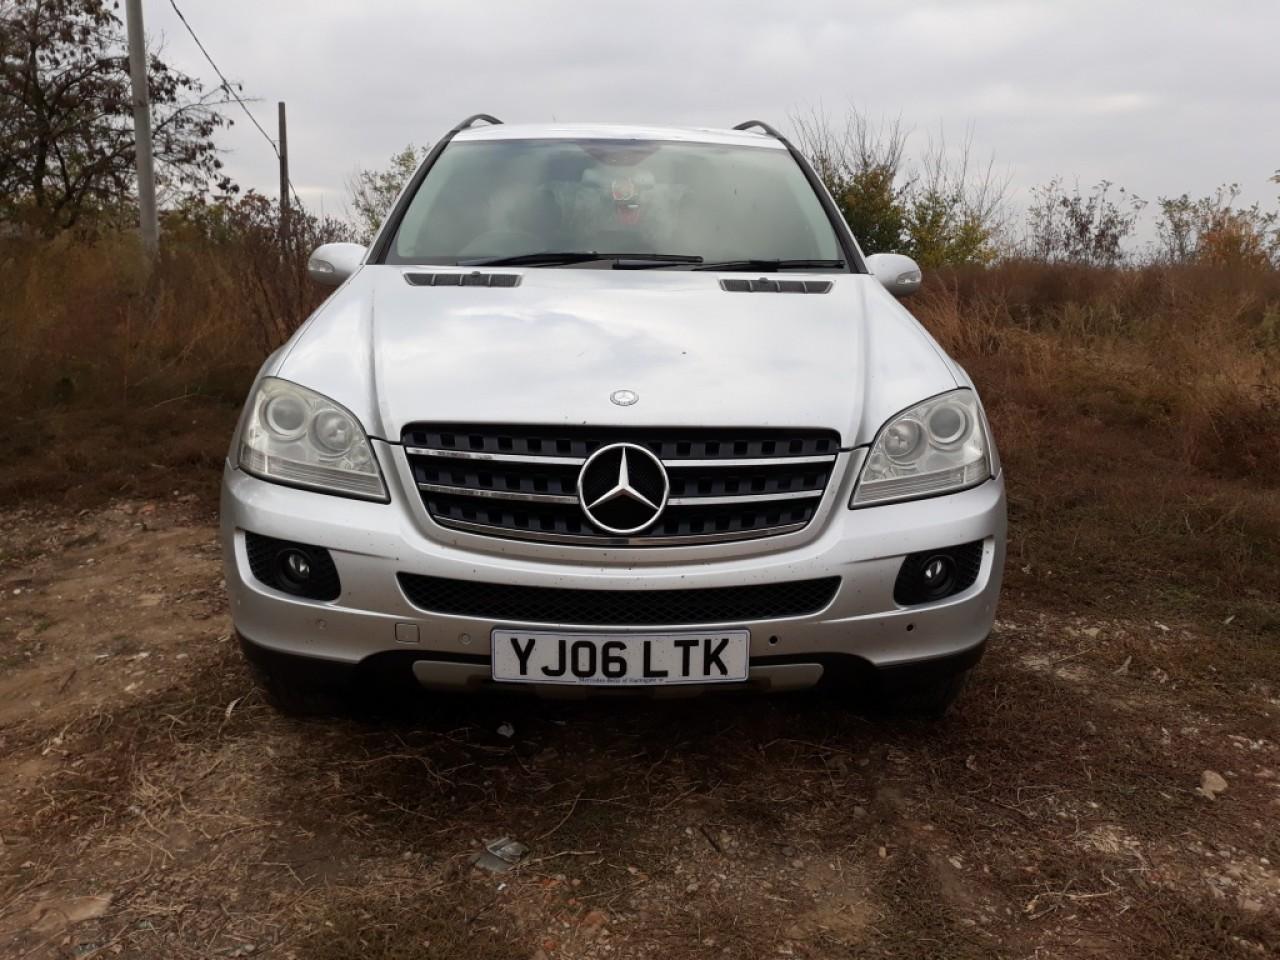 Galerie evacuare Mercedes M-CLASS W164 2007 SUV 3.0